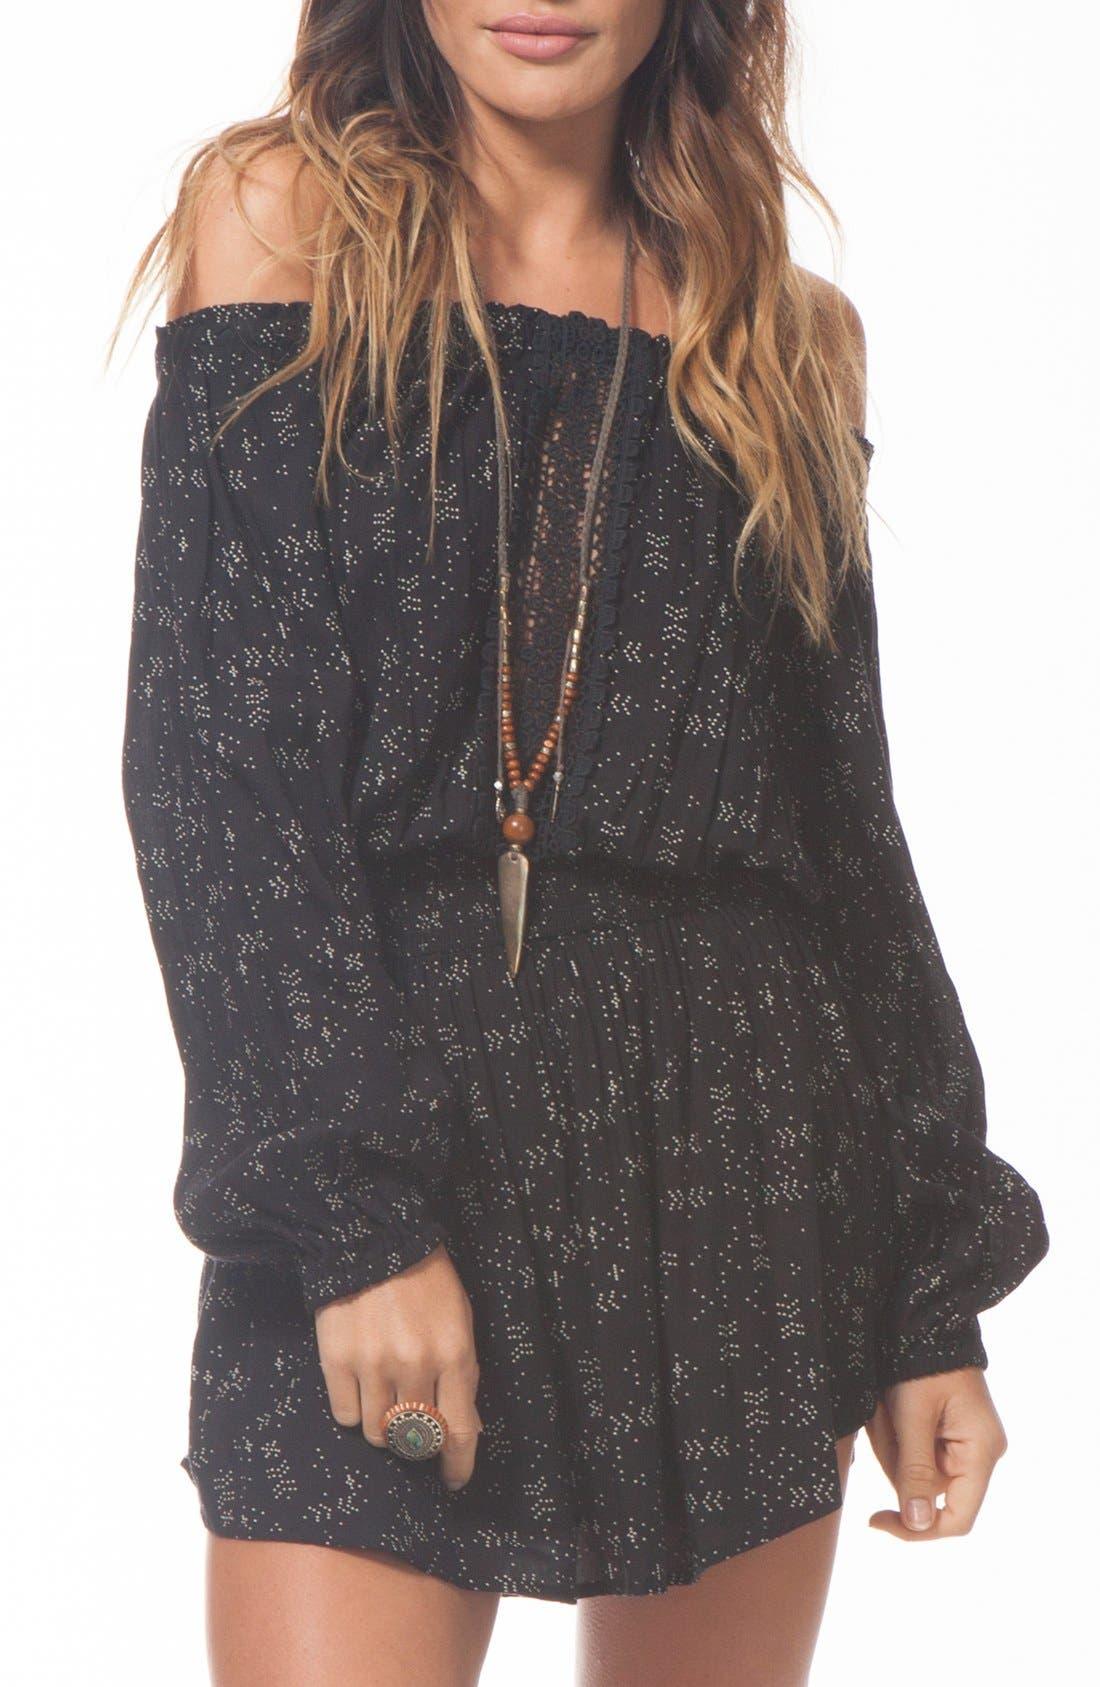 Alternate Image 1 Selected - Rip Curl 'Starlight' Print Off the Shoulder Dress